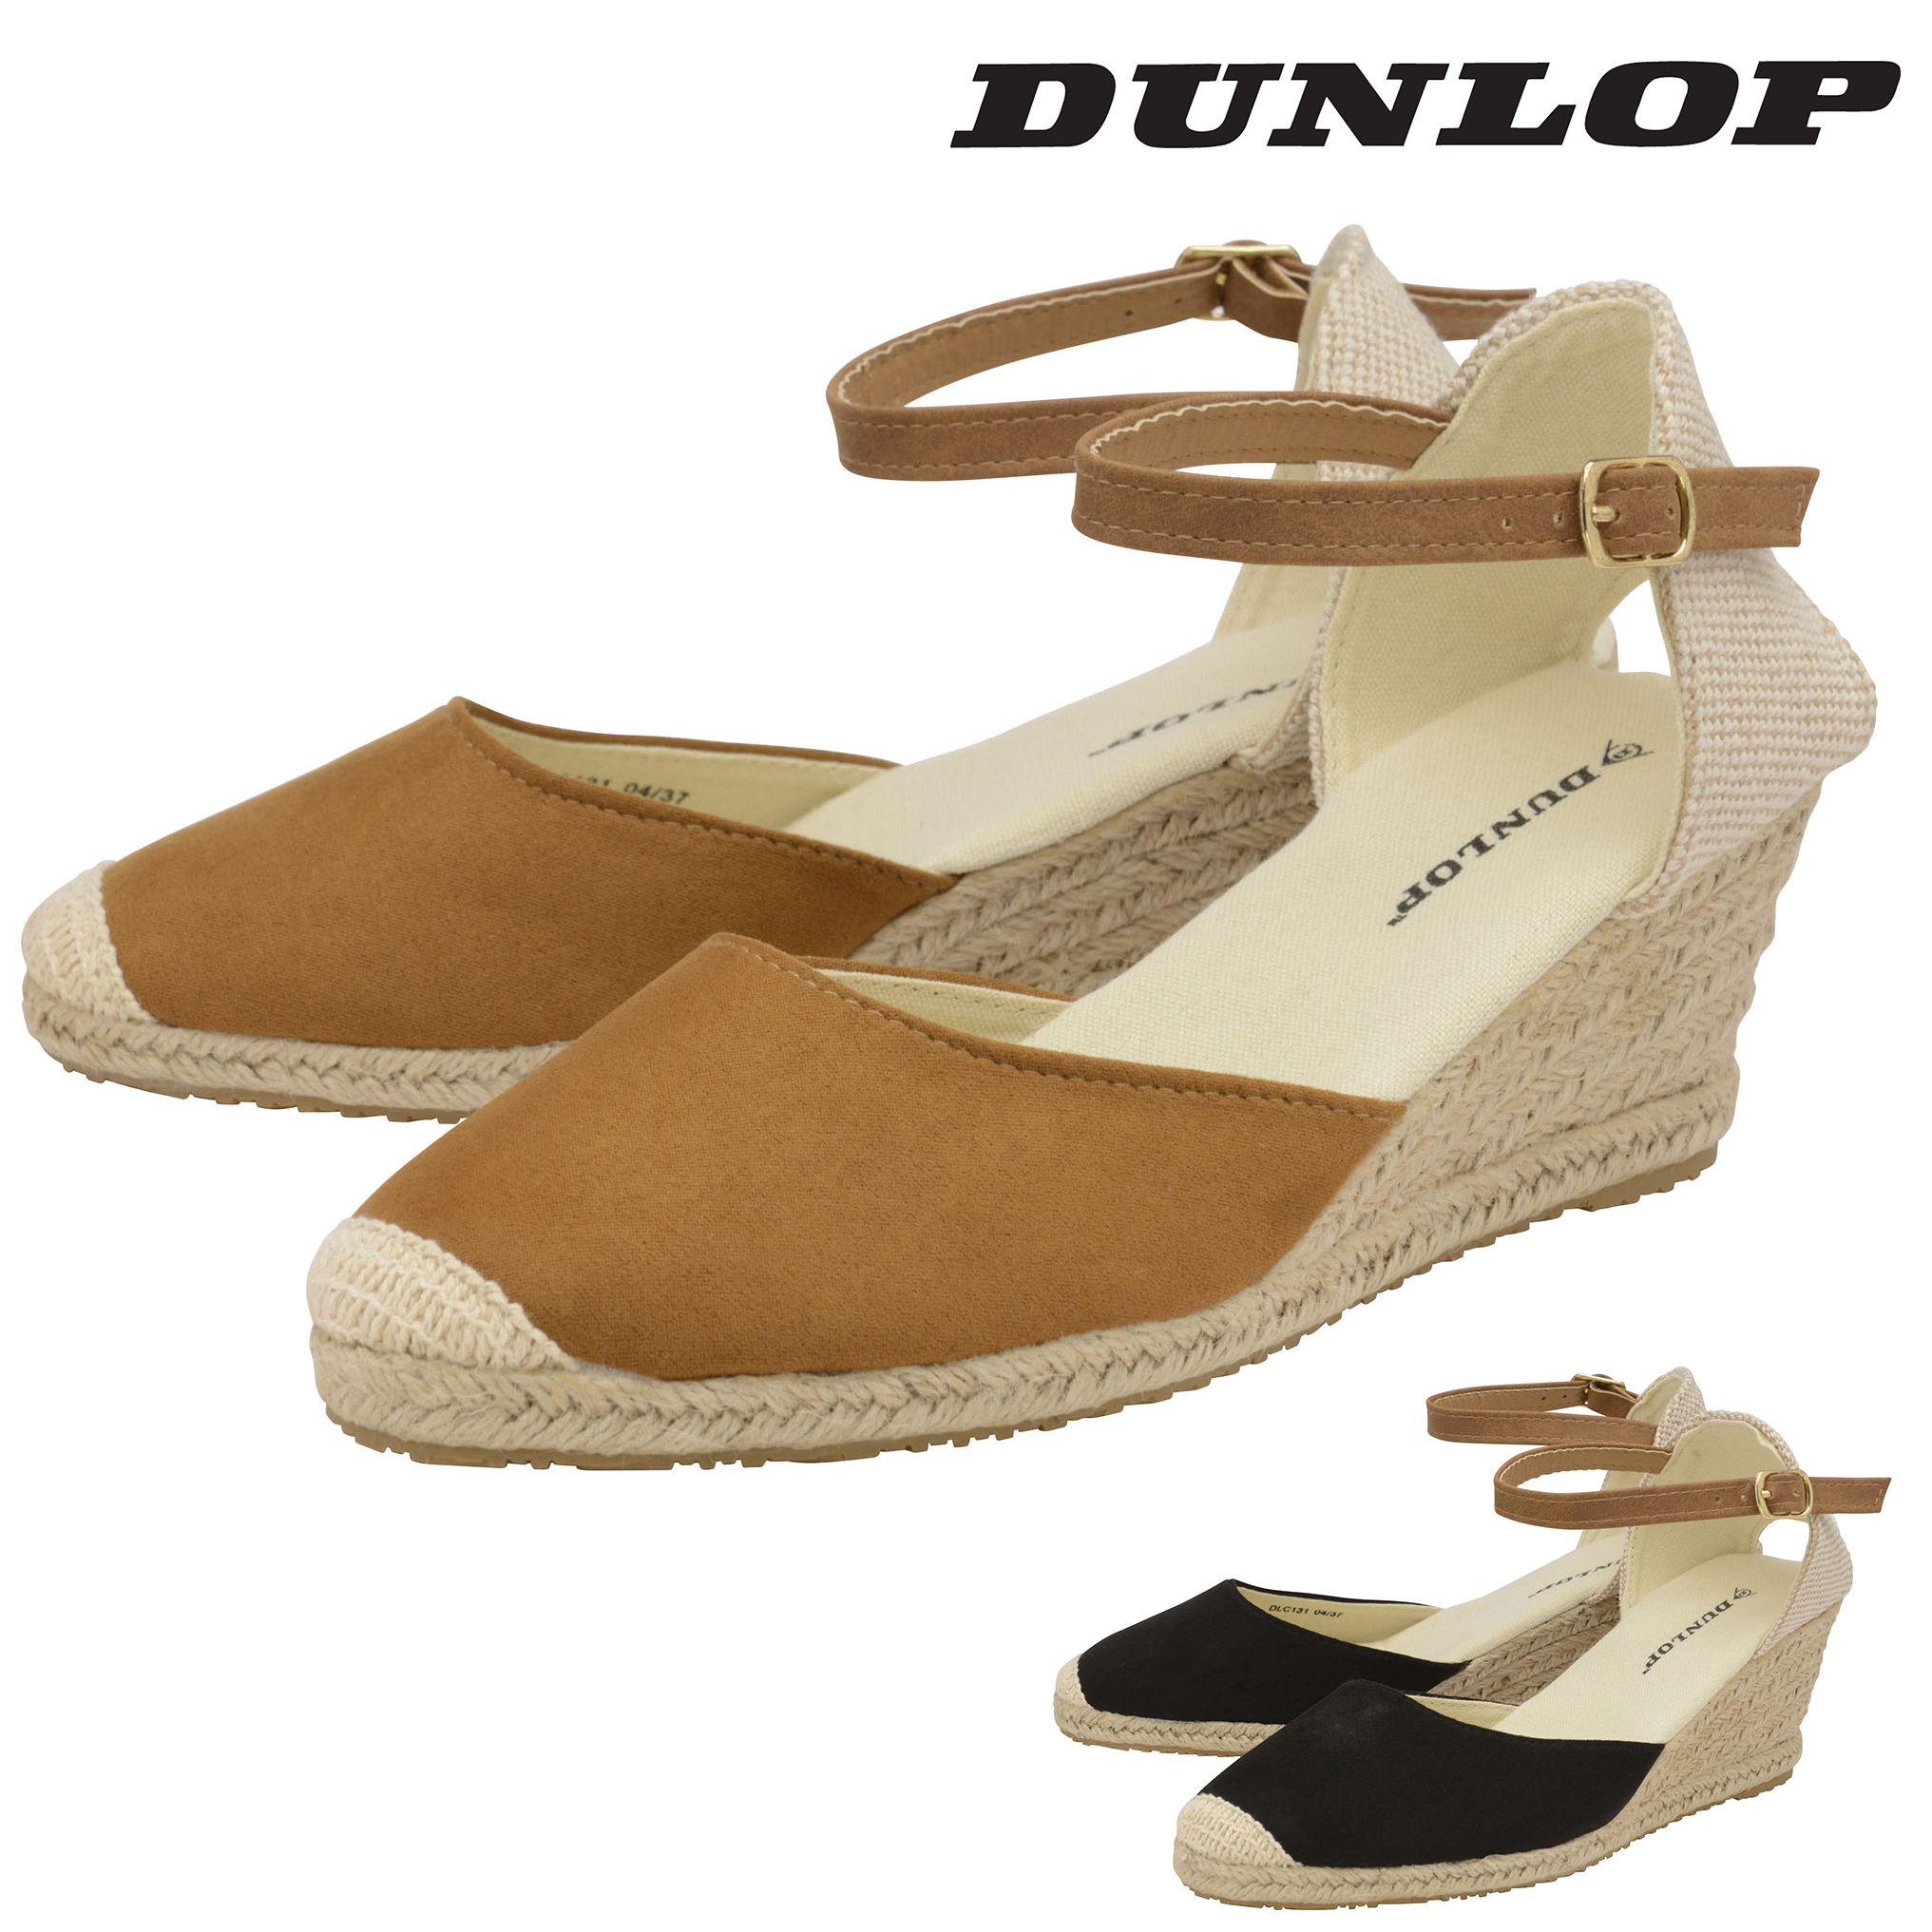 Ladies Women Low Heel Wedge Summer Sandal Buckle Strap Espadrilles Shoe Size 3-8